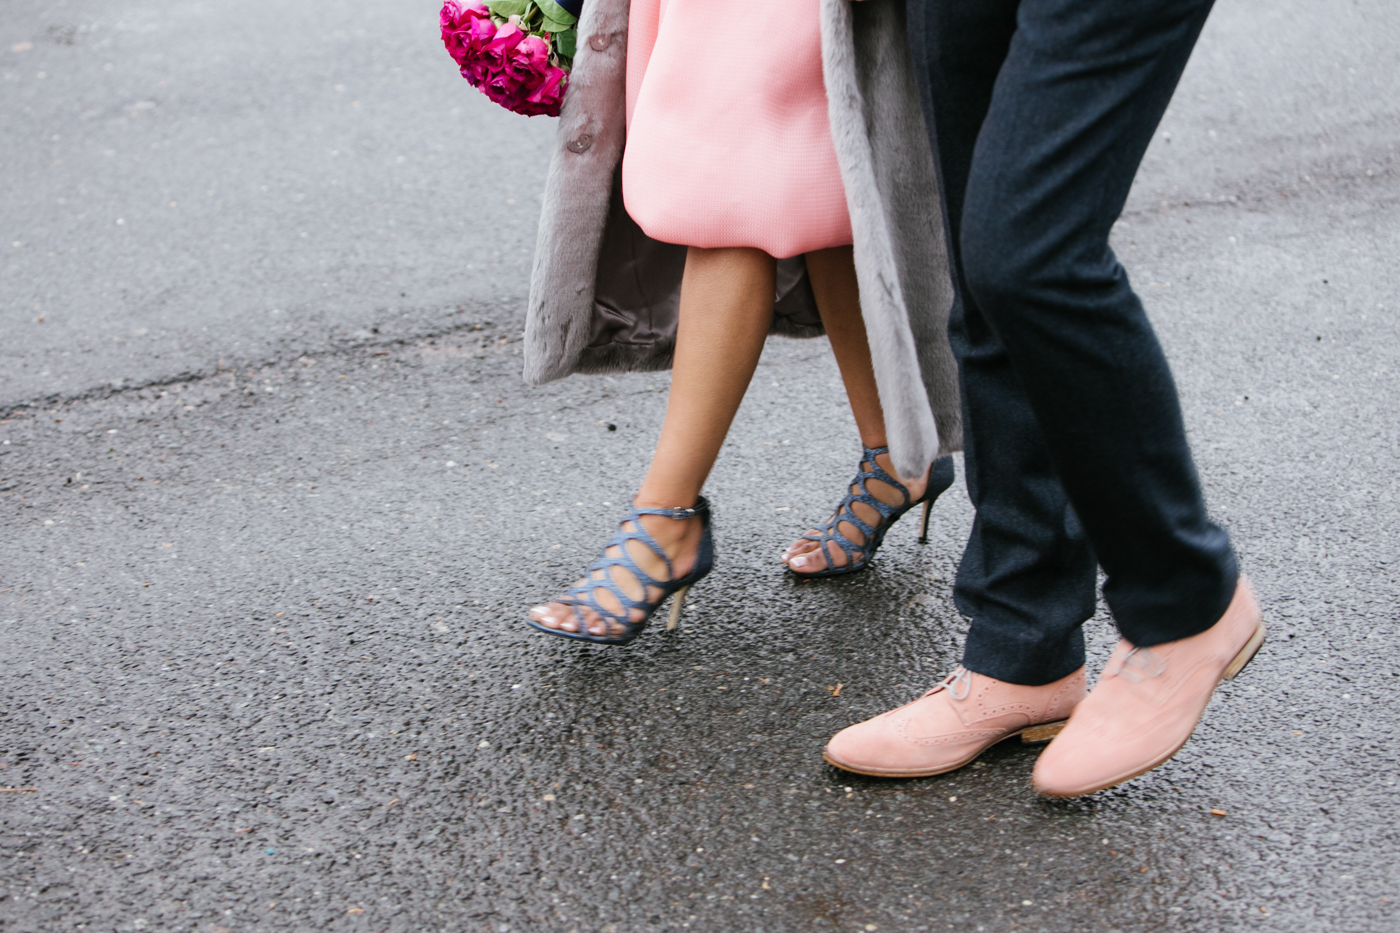 Central-park-wedding-by-Tanya-Isaeva-120.jpg